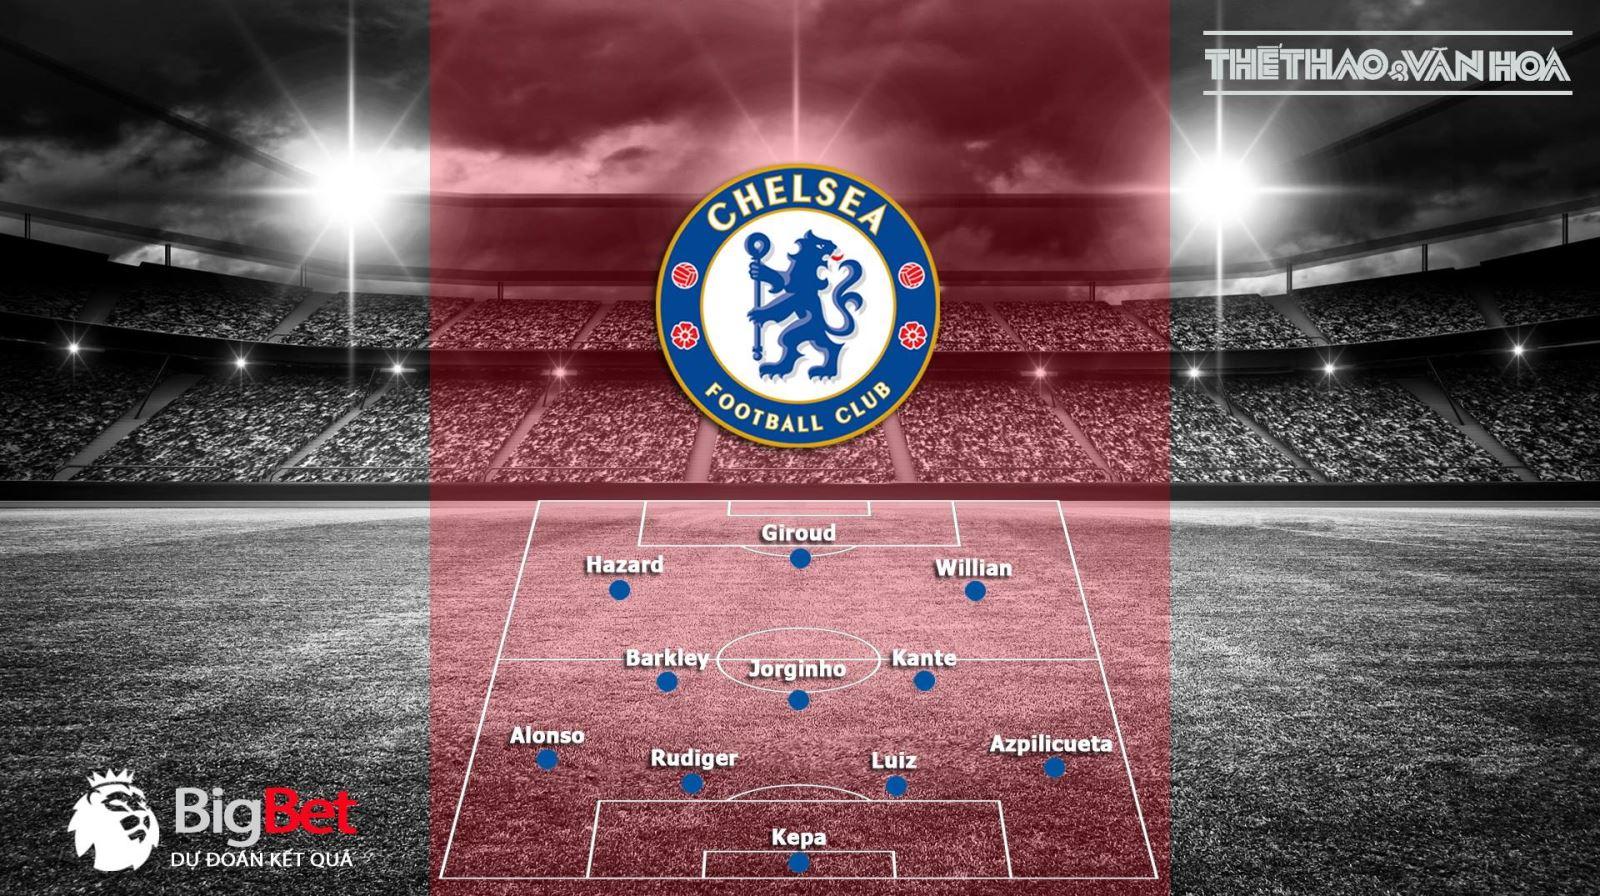 Trực tiếp Chelsea vs MU. MU. Kèo MU vs Chelsea. Soi kèo MU. Trực tiếp bóng đá